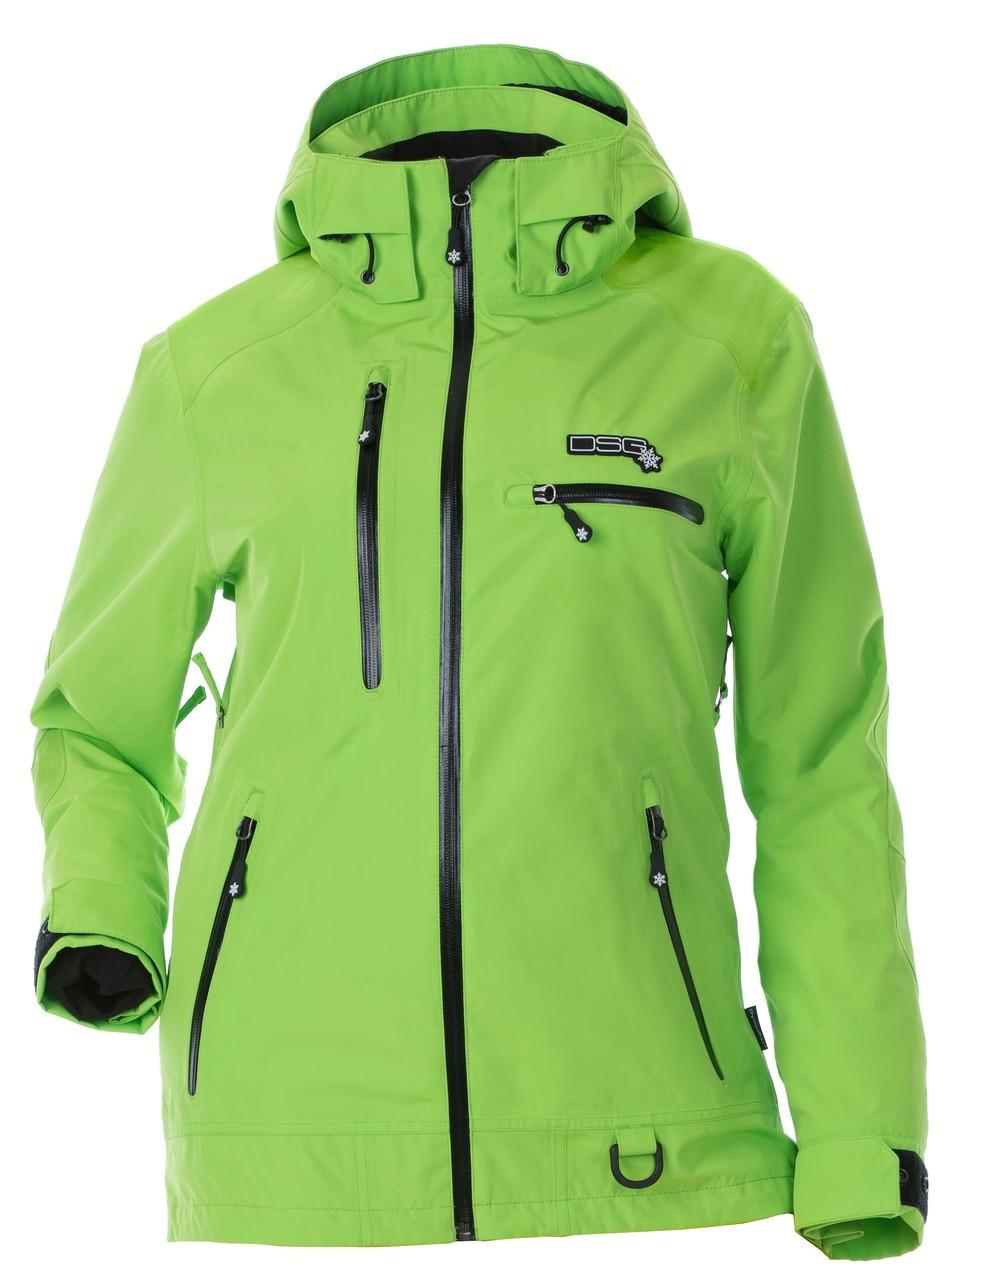 3385854e51049 Prizm Green Technical Jacket | Women's Green Snowmobile Jacket